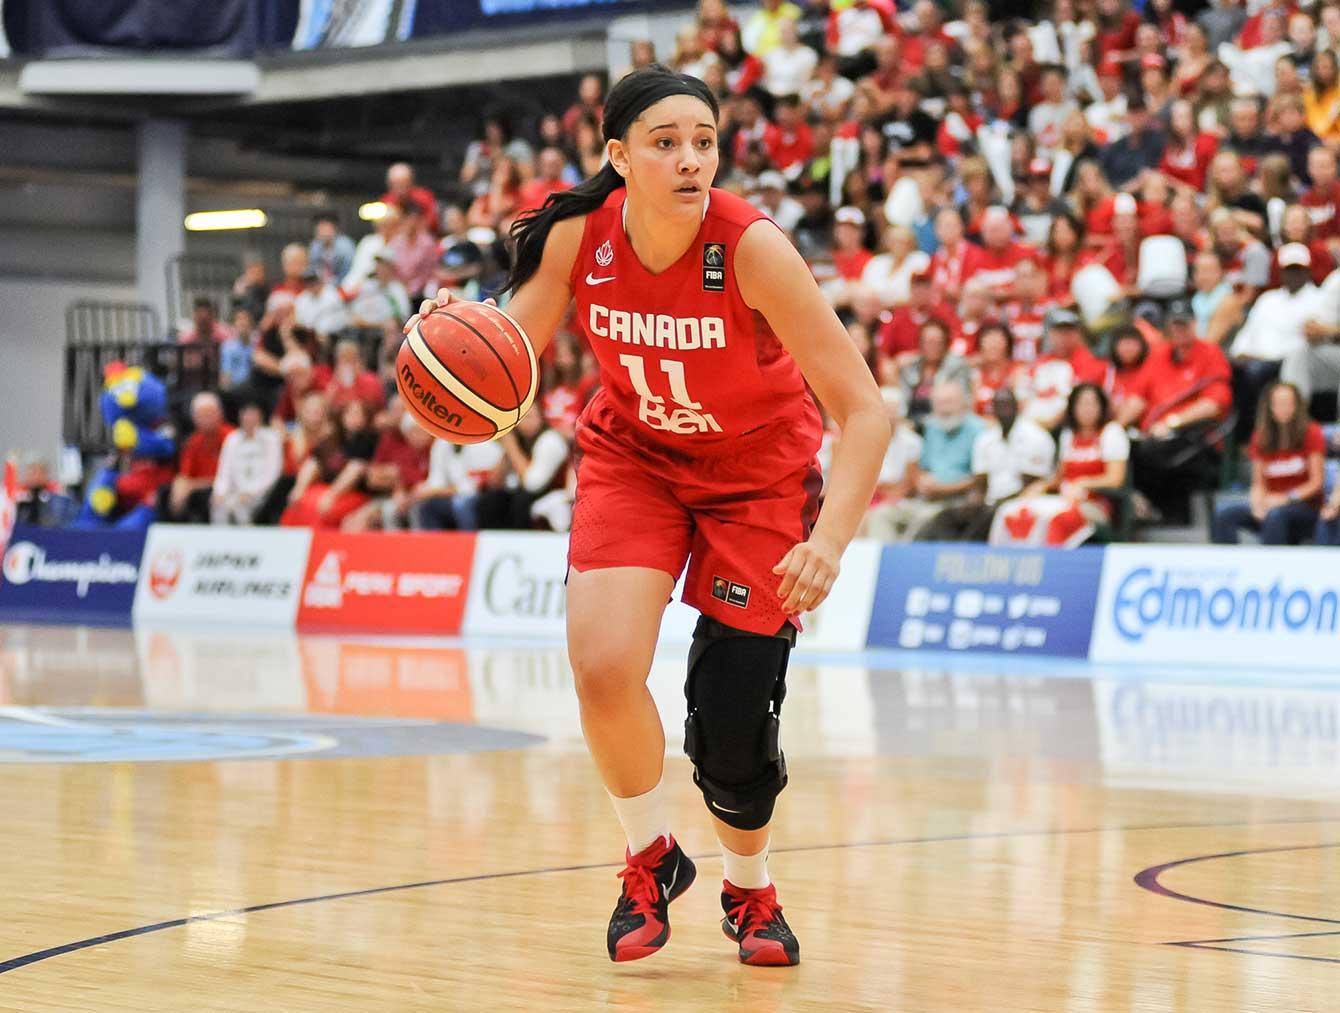 Natalie Achonwa played 18:17 in the game. (Photo: FIBA)